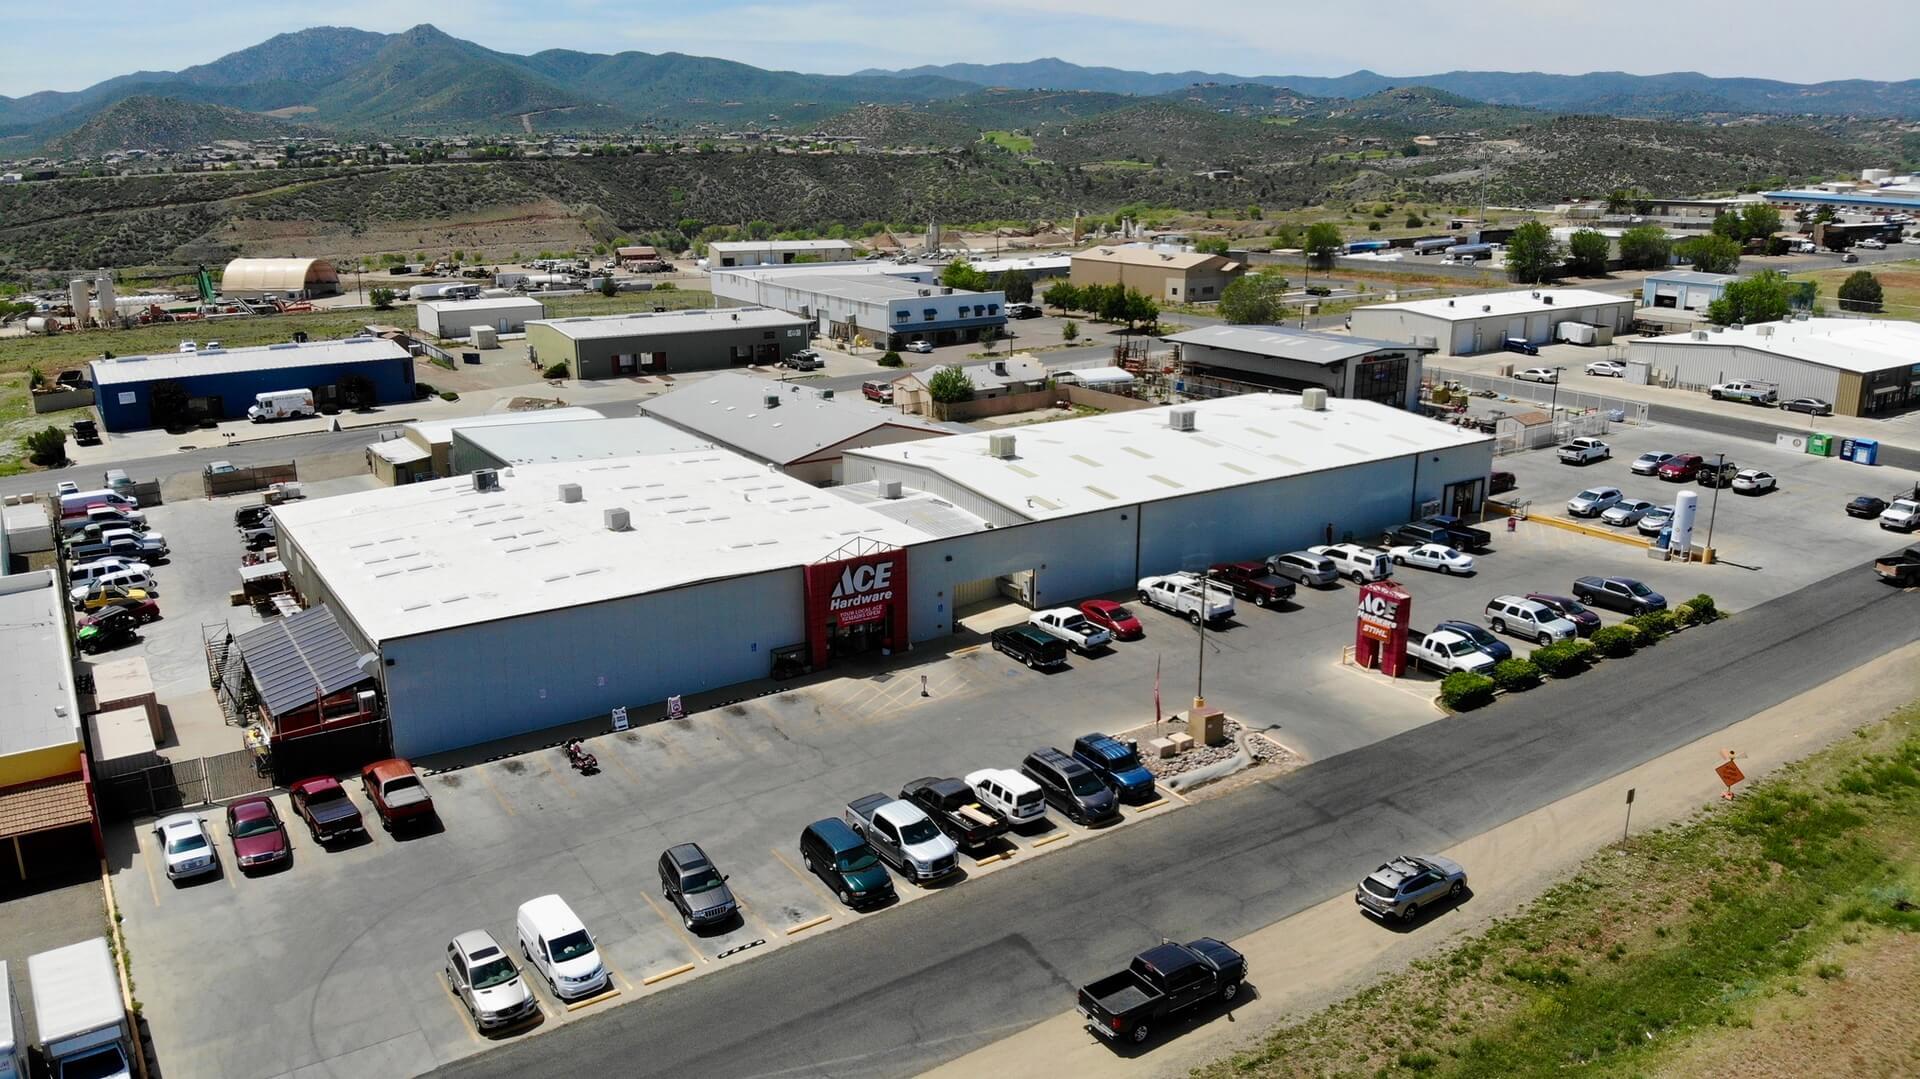 Ace Hardware Distribution Center